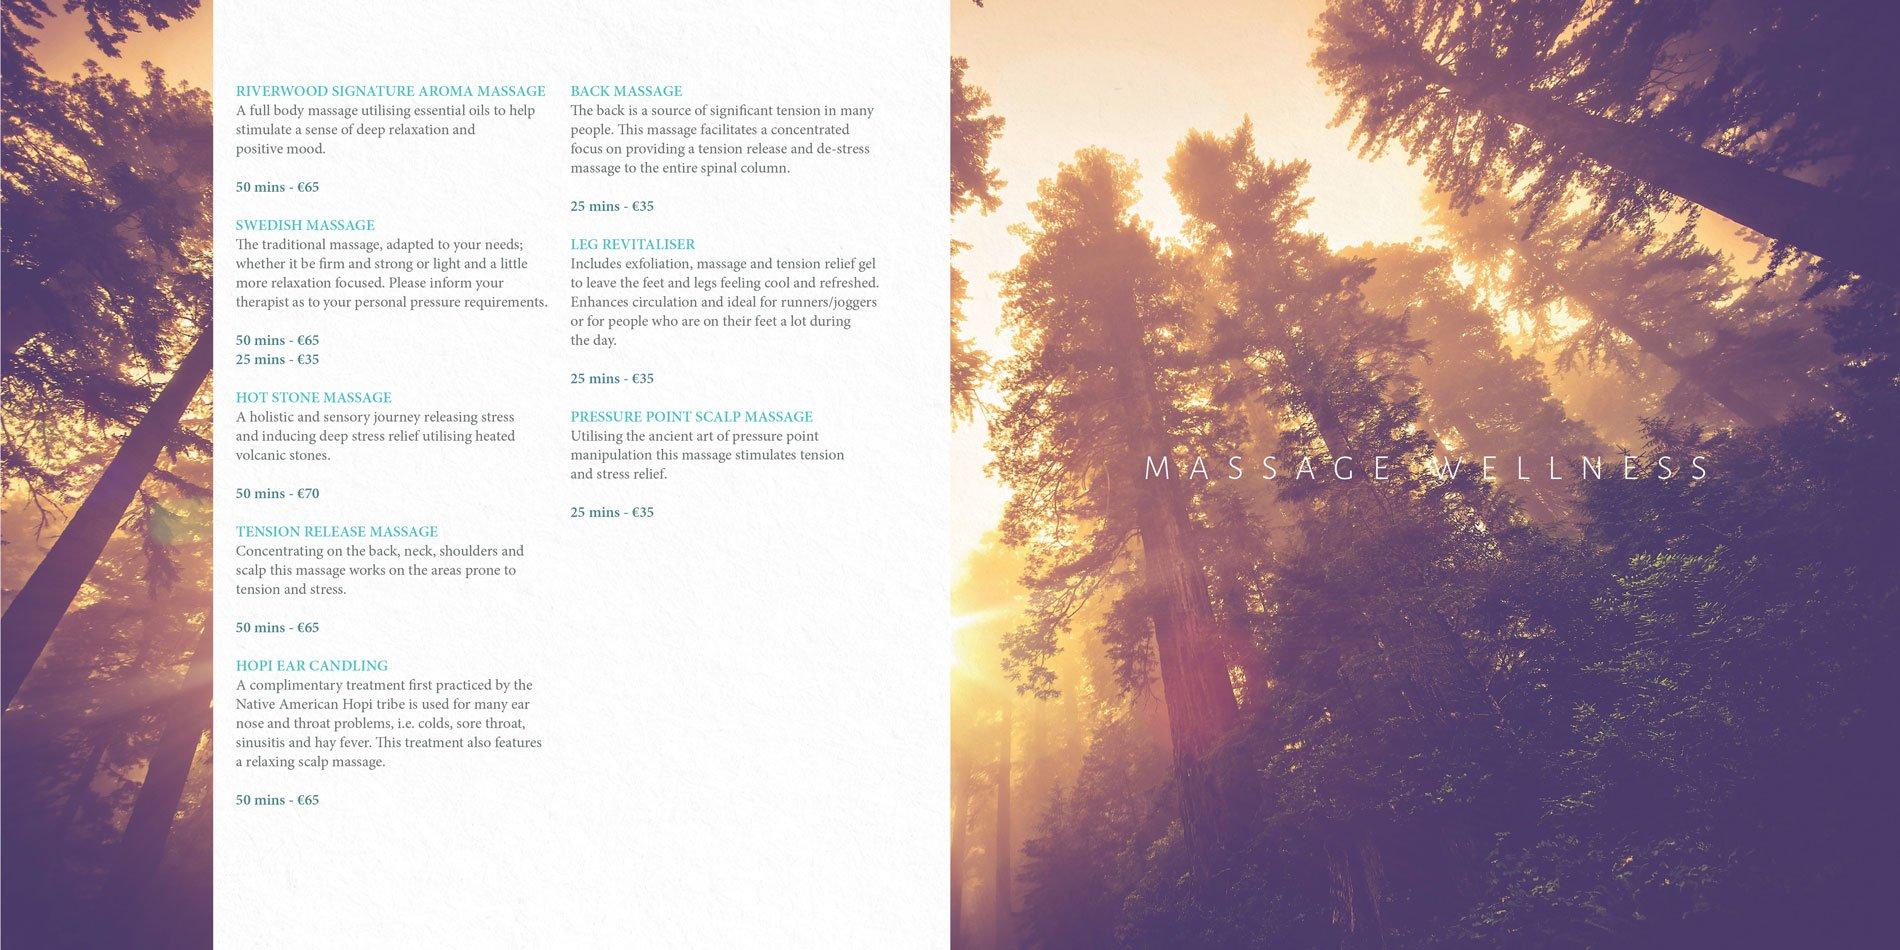 brochure design wexford. Pixelpod graphic design and branding in wexford.